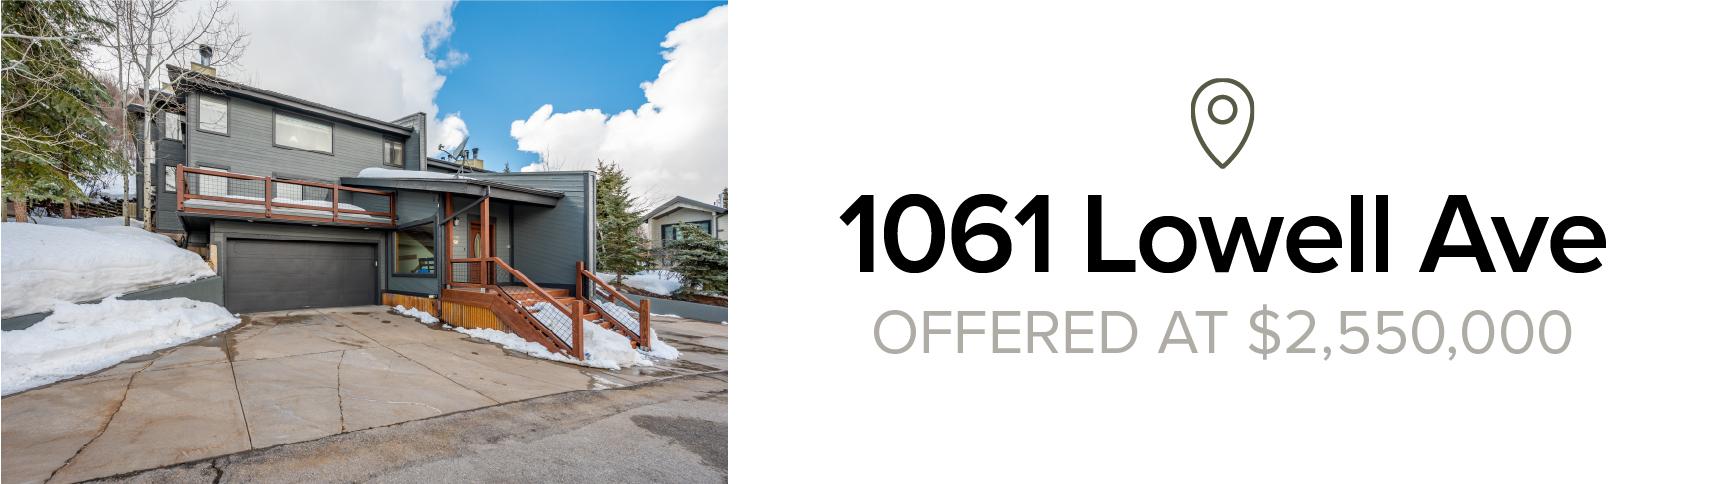 1061 HORI BLOCK PRICE